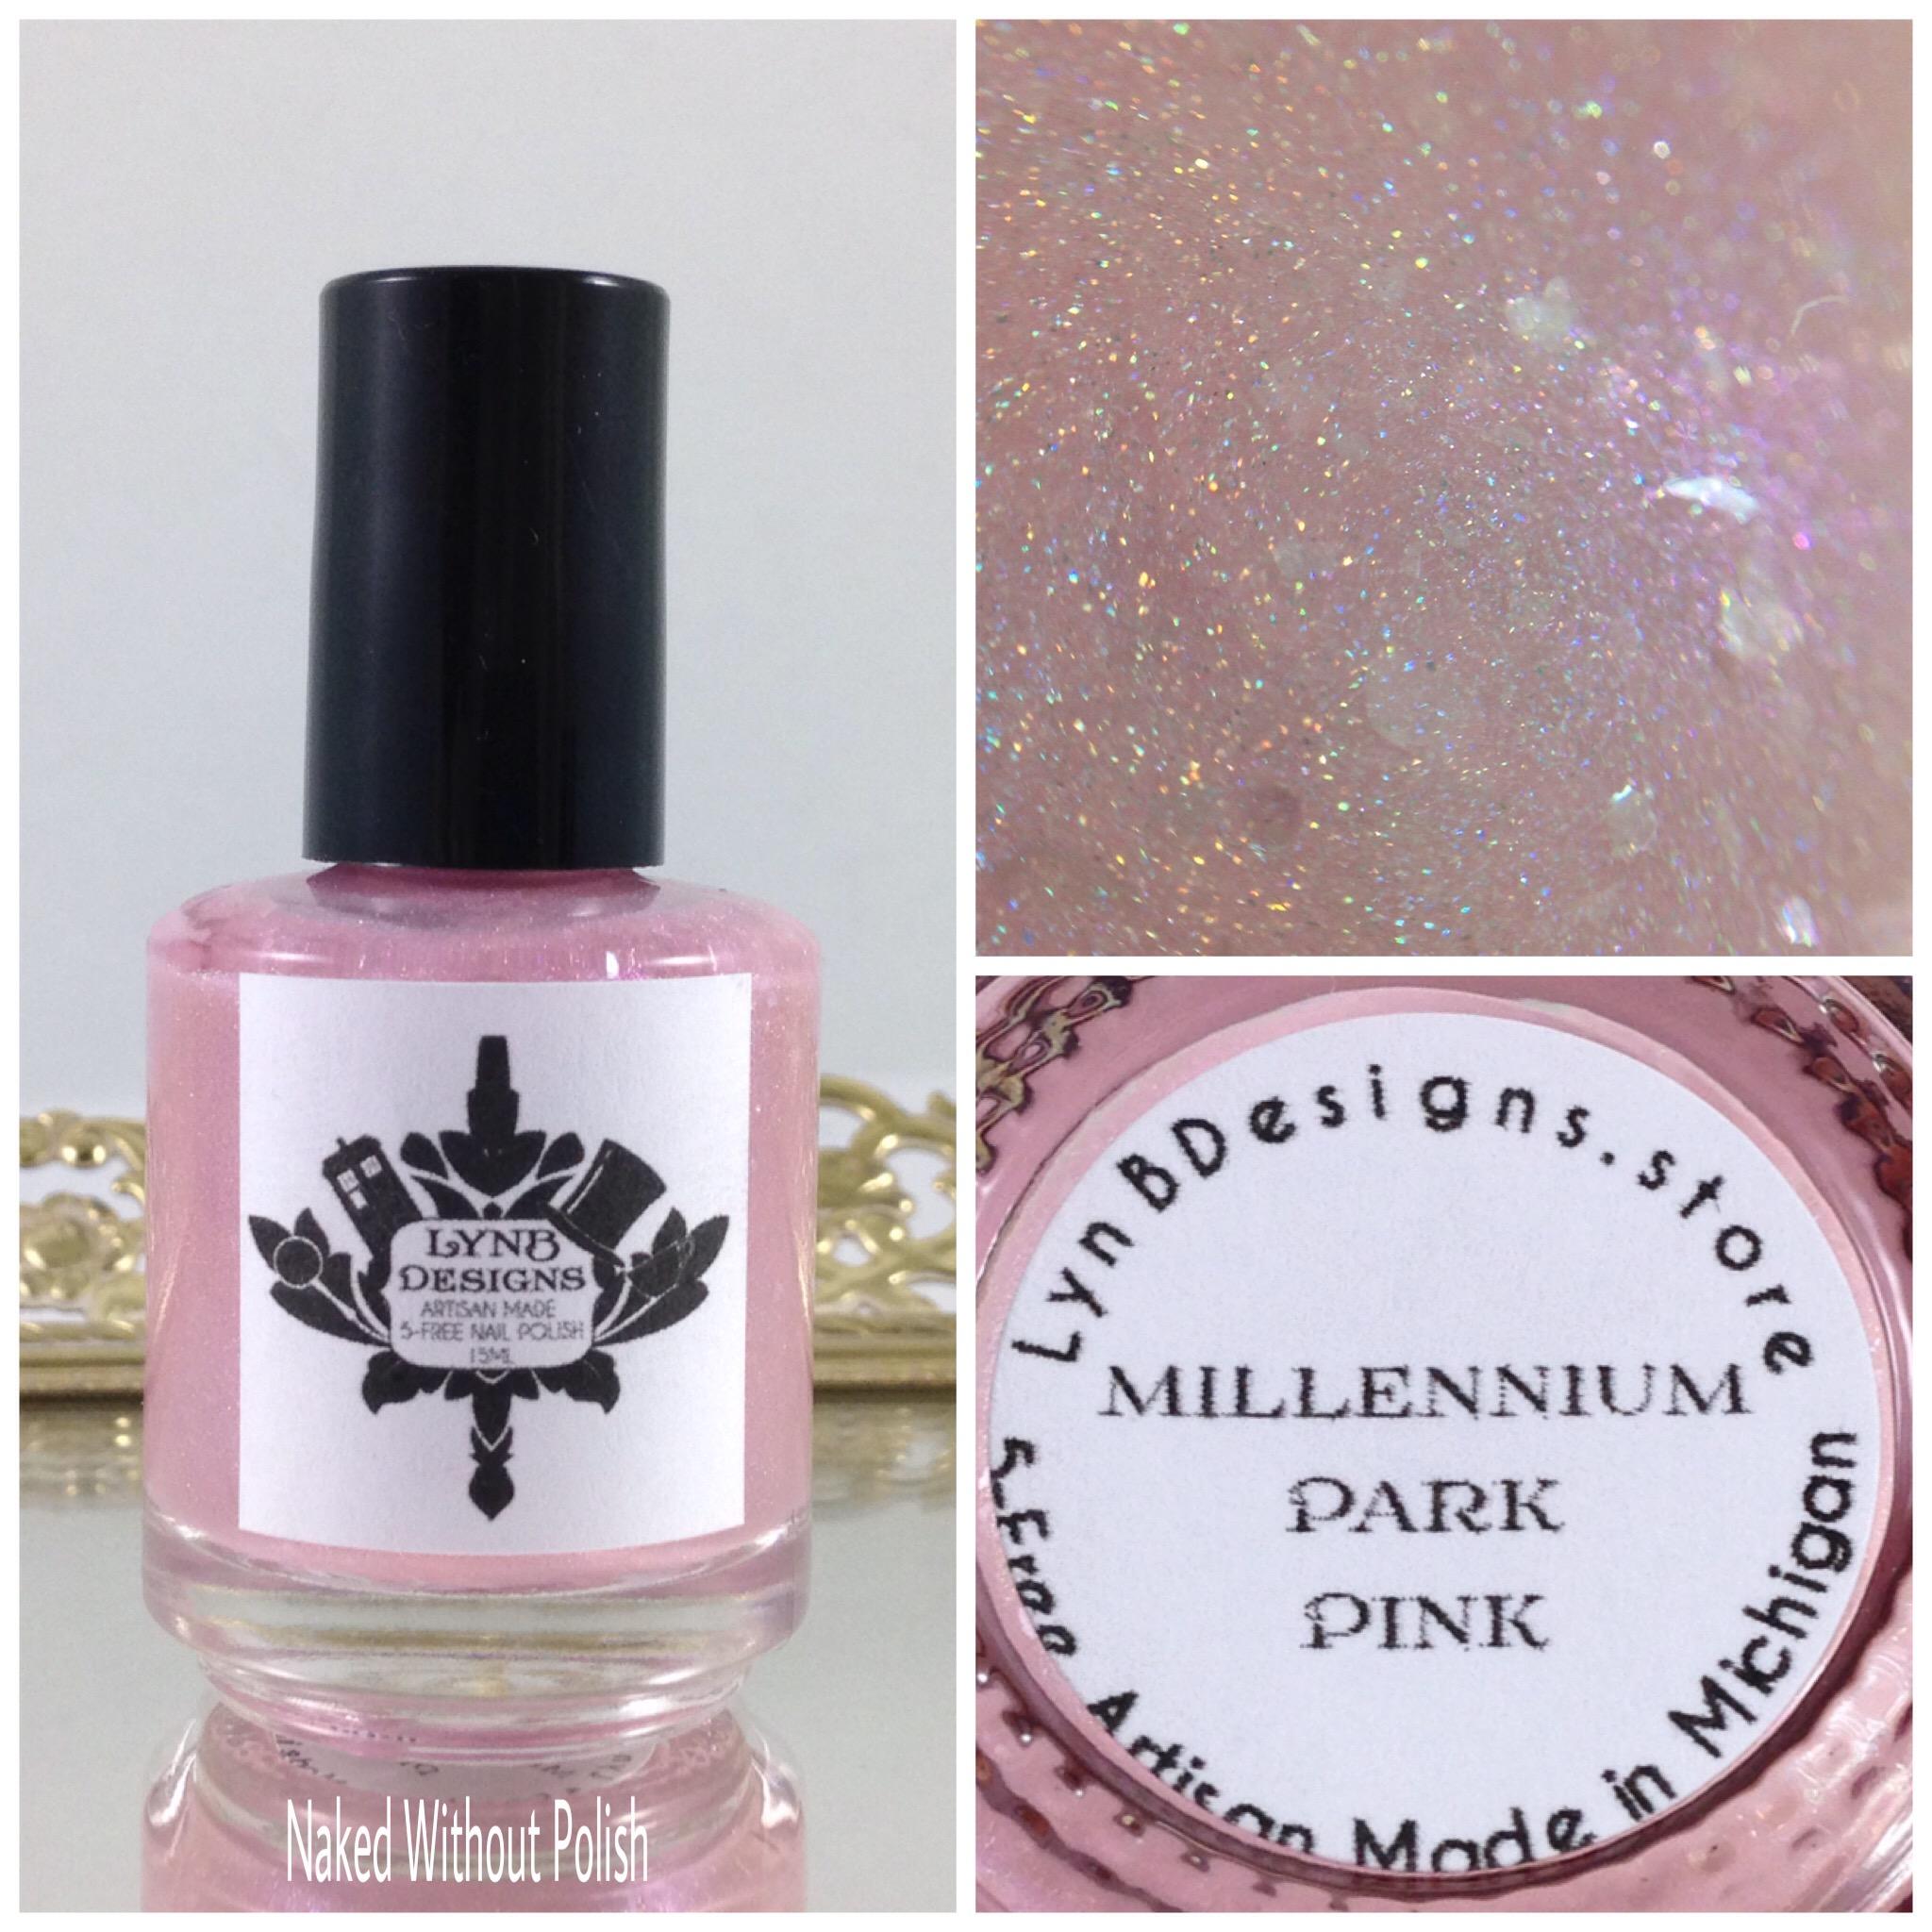 LynBDesigns-Polish-Con-Millennium-Park-Pink-1